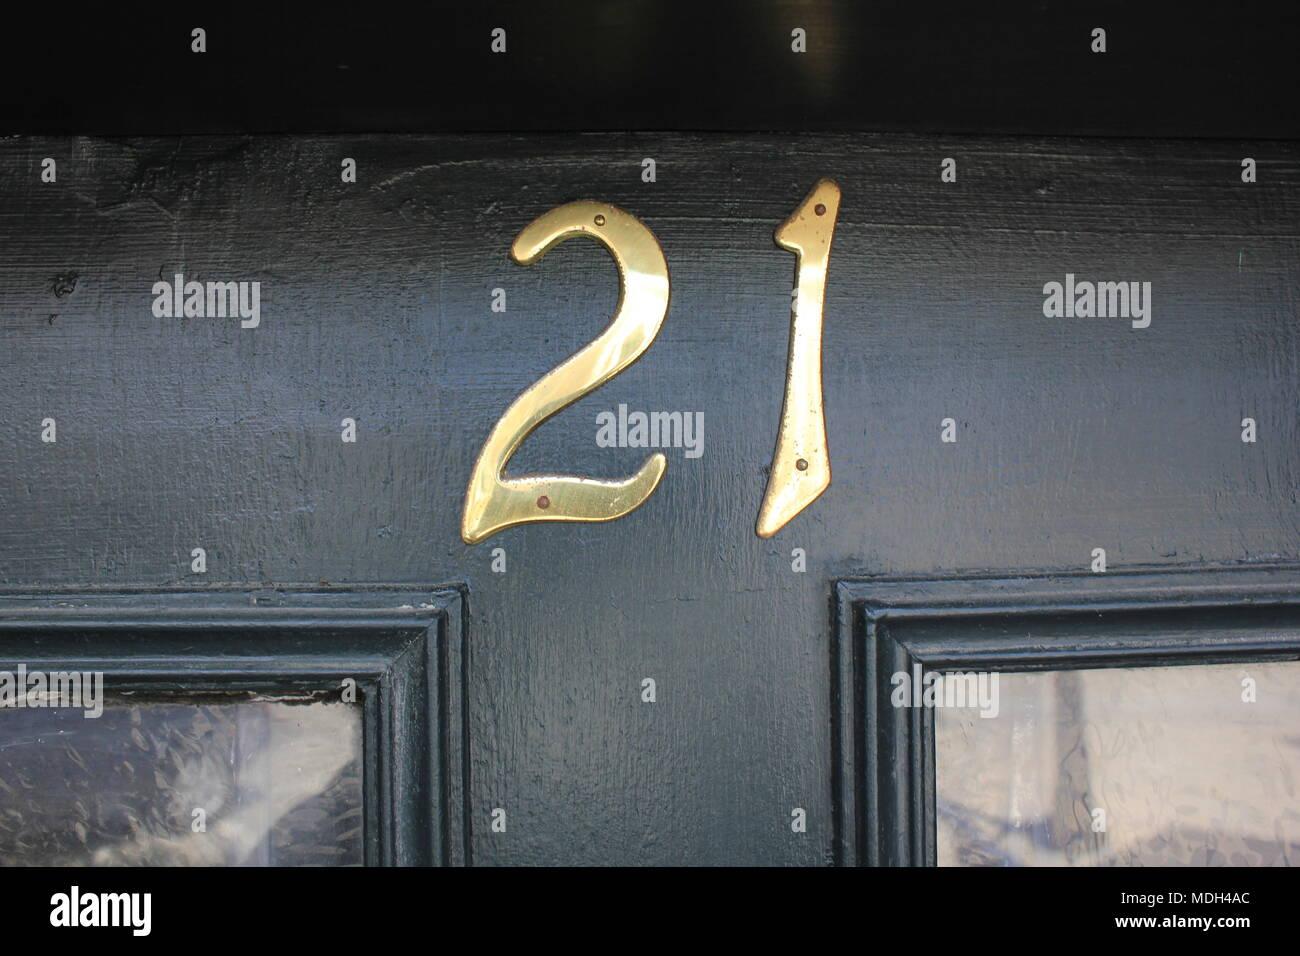 Card Number 22 Stockfotos & Card Number 22 Bilder - Alamy